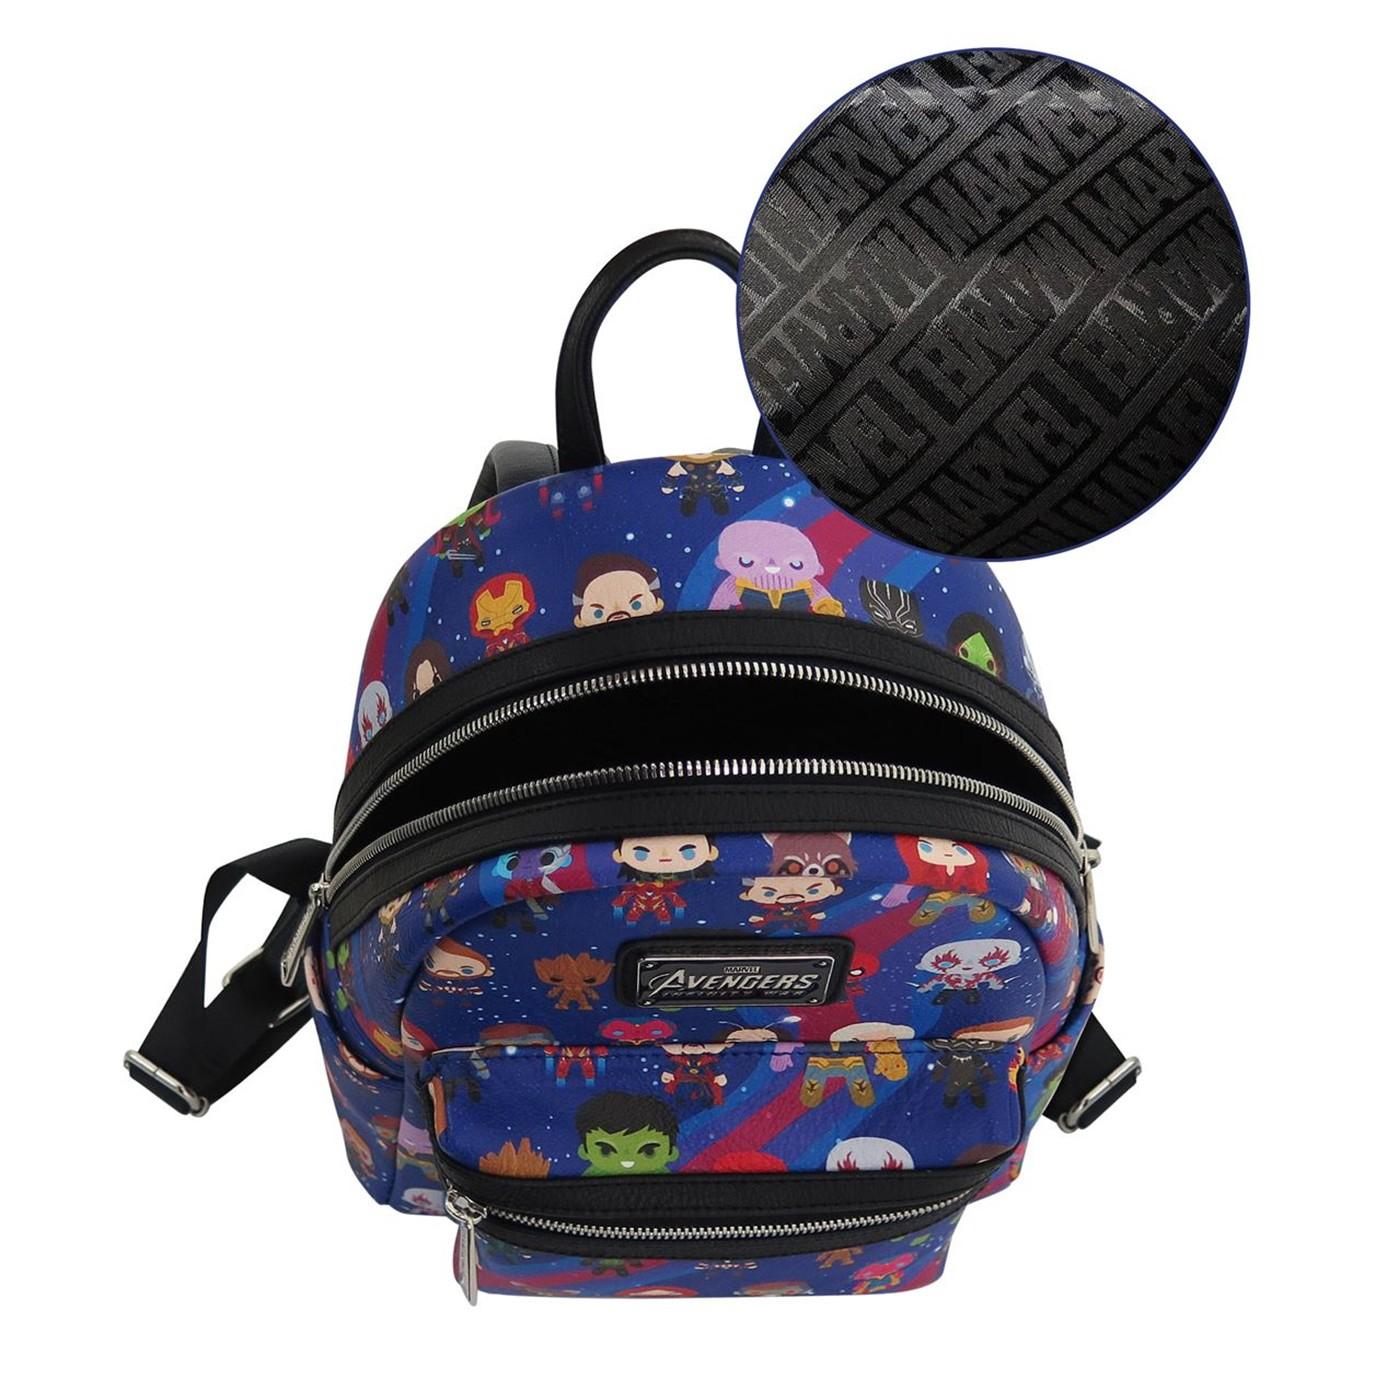 Avengers Infinity War Kawaii Loungefly Mini Backpack